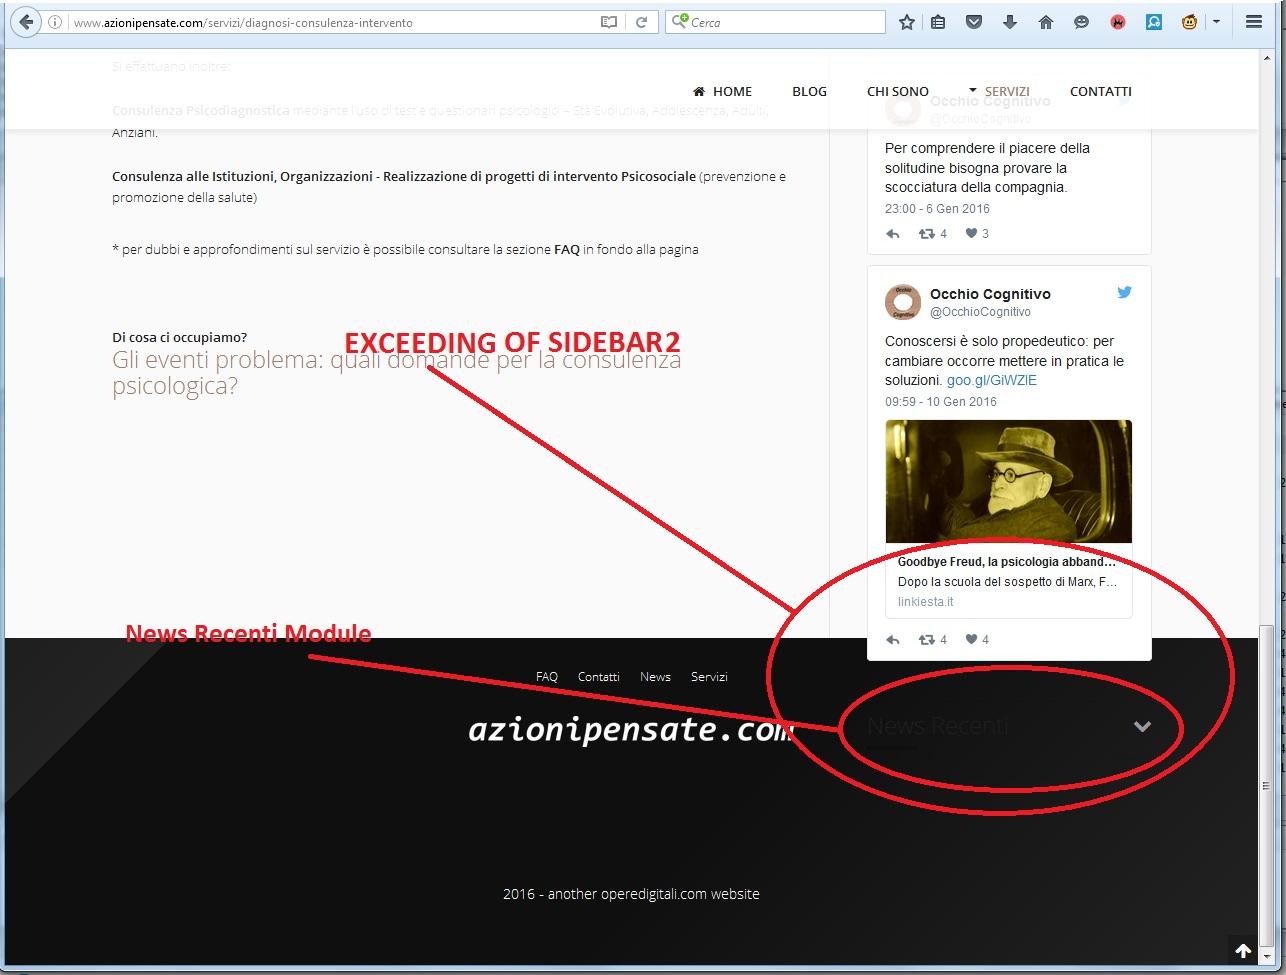 ExceedingofSidebar2.jpg